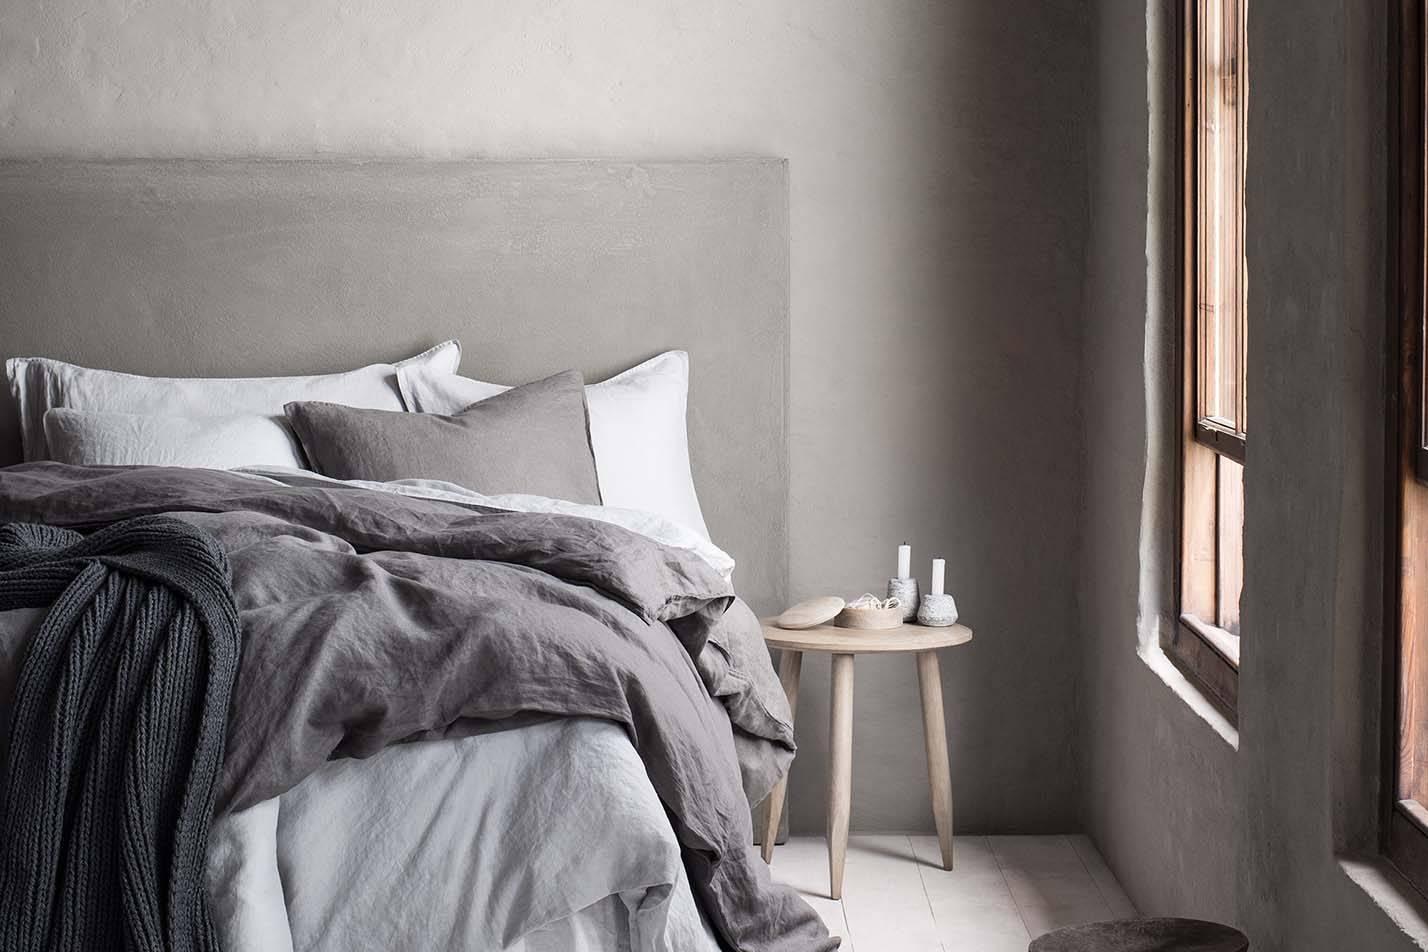 Shopping d 39 automne chez h m home for Chambre a coucher 2016 maroc